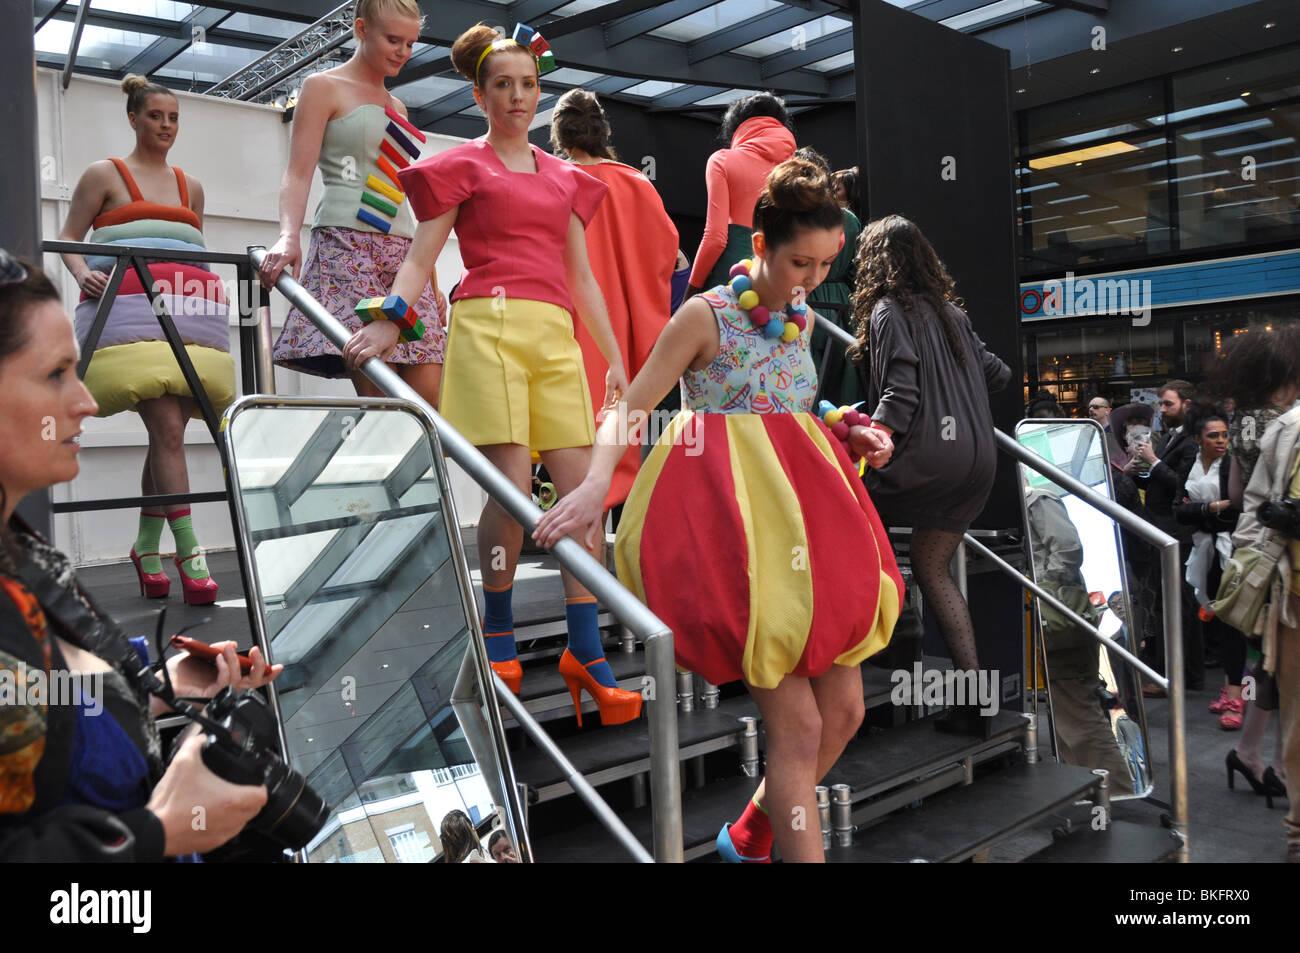 Models wait at London's annual Alternative Fashion Week-Spitalfields. England UK - Stock Image